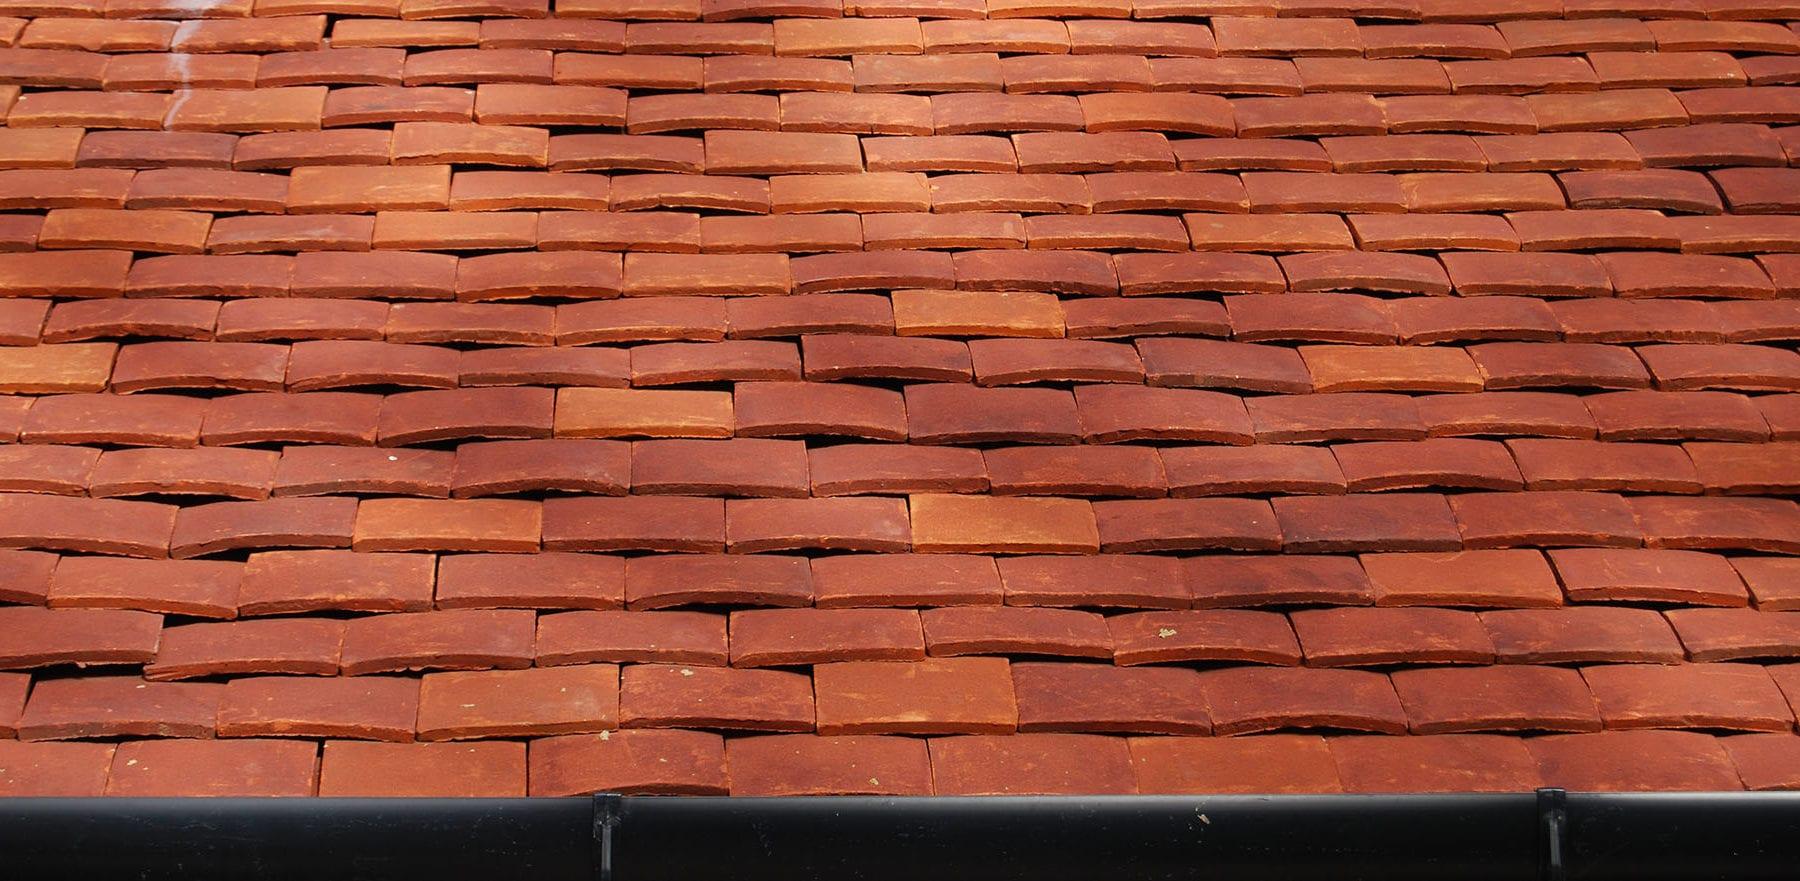 Lifestiles - Handmade Red Clay Roof Tiles - Rudley Oaks, England 3